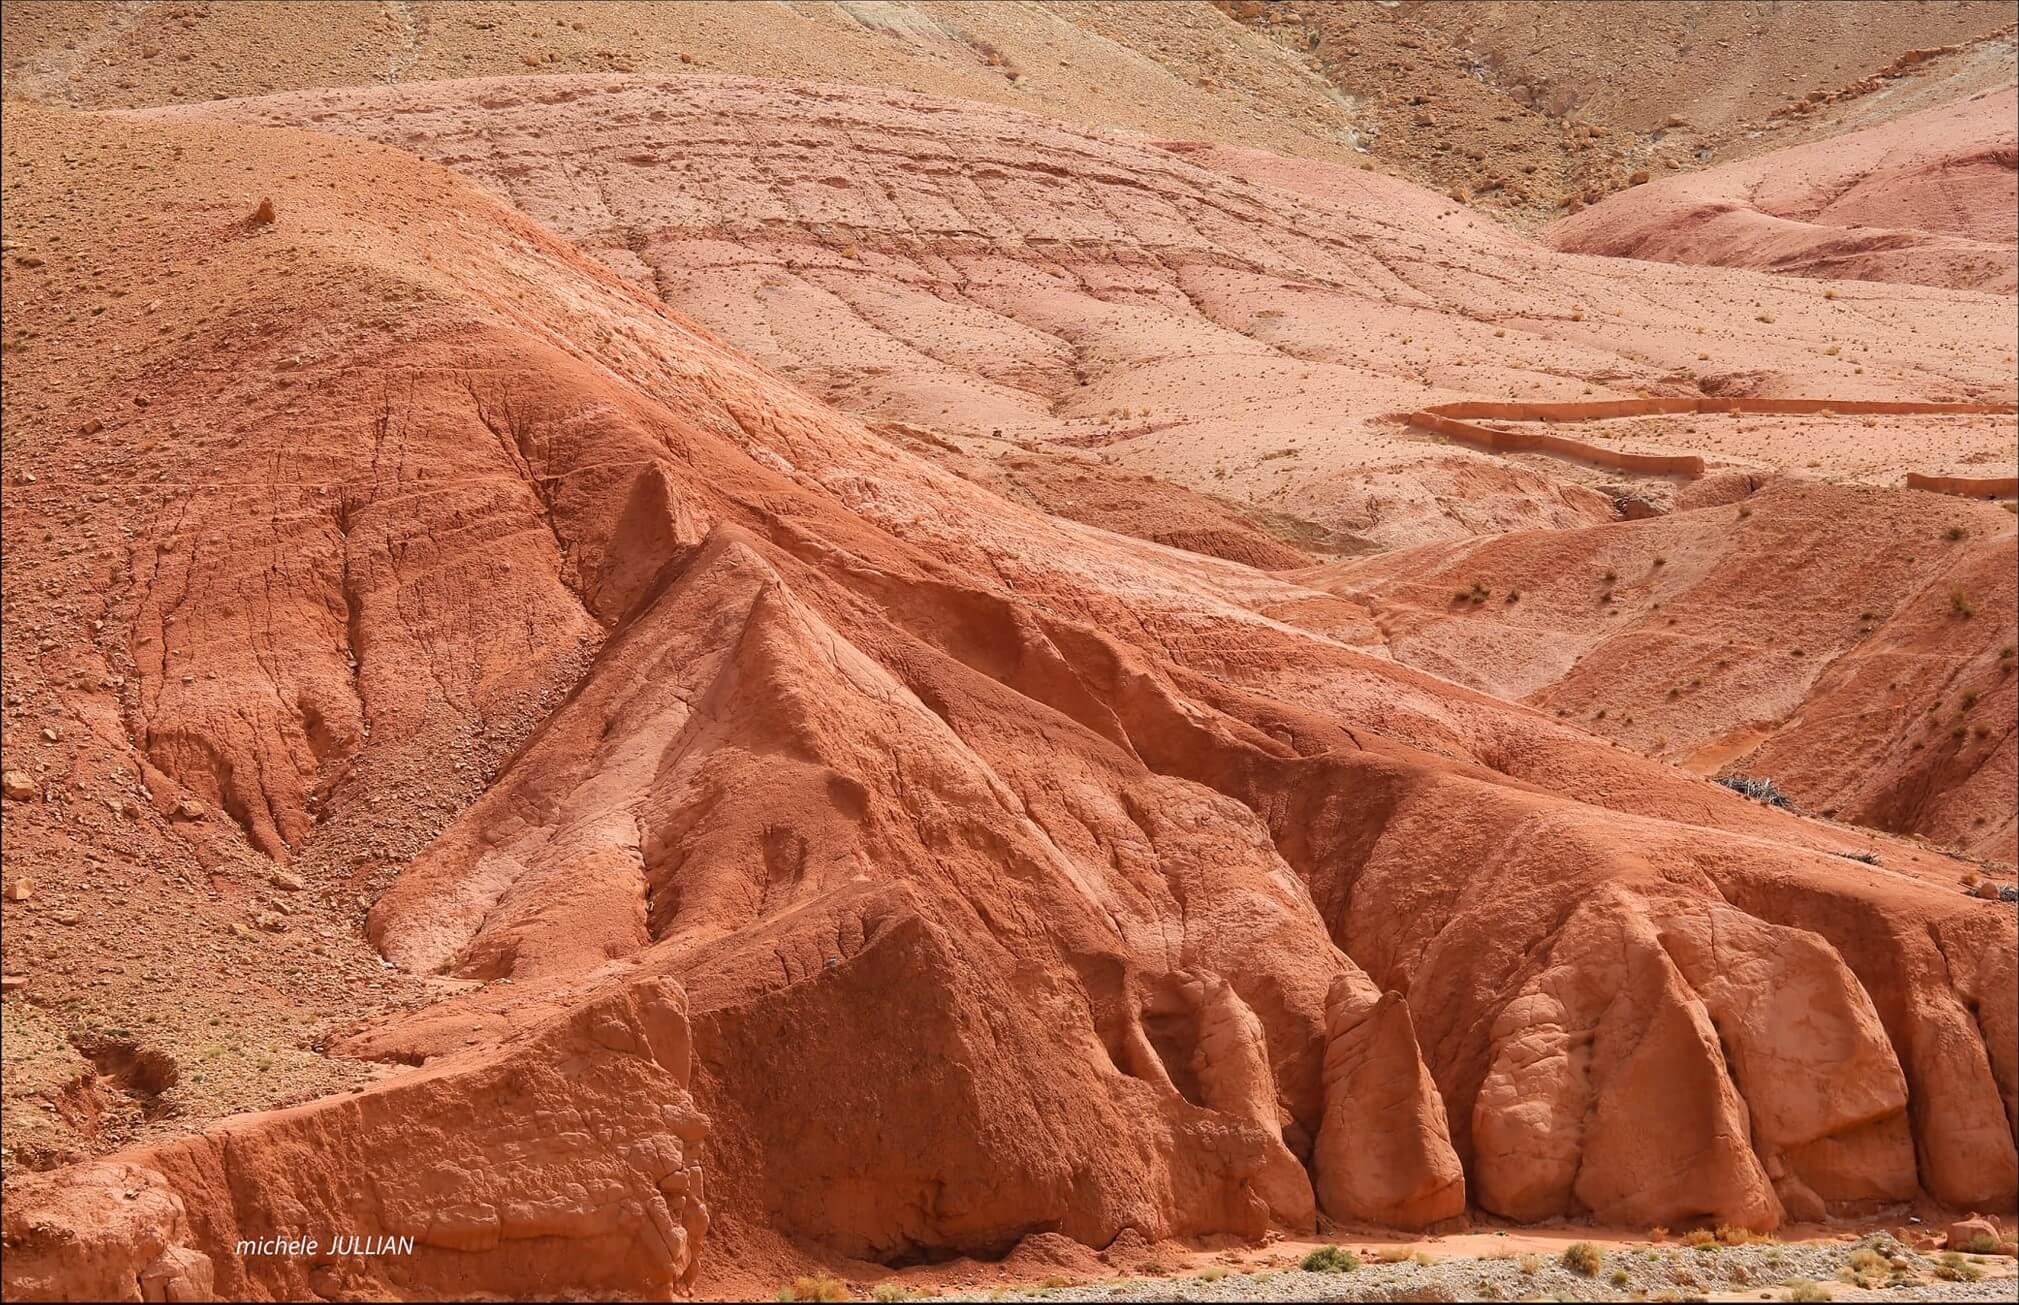 terres rouges vers M'gounna au maroc